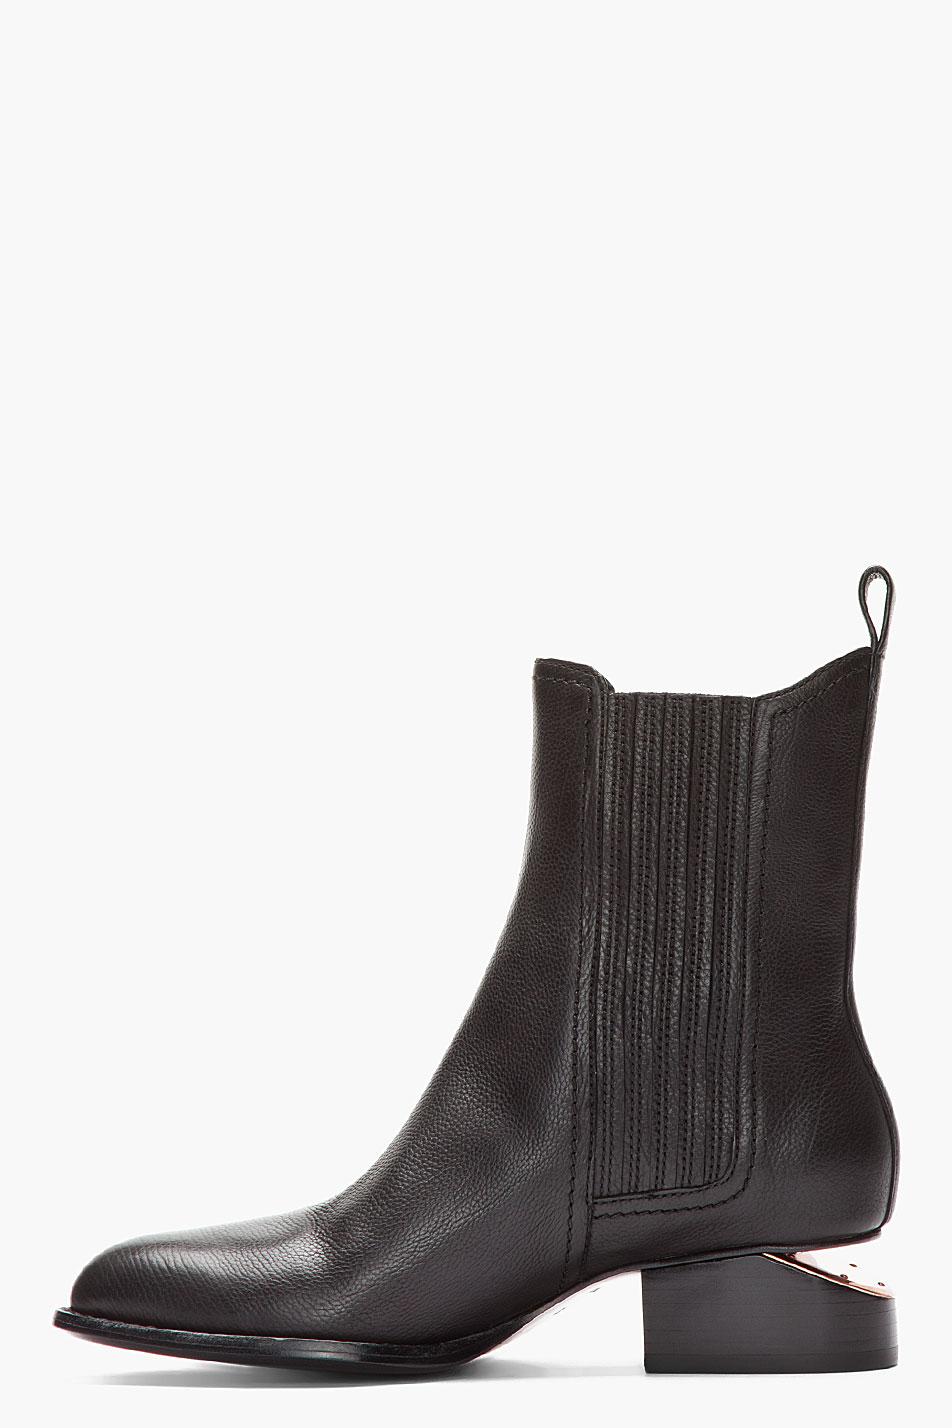 alexander wang anouck chelsea boots in black lyst. Black Bedroom Furniture Sets. Home Design Ideas